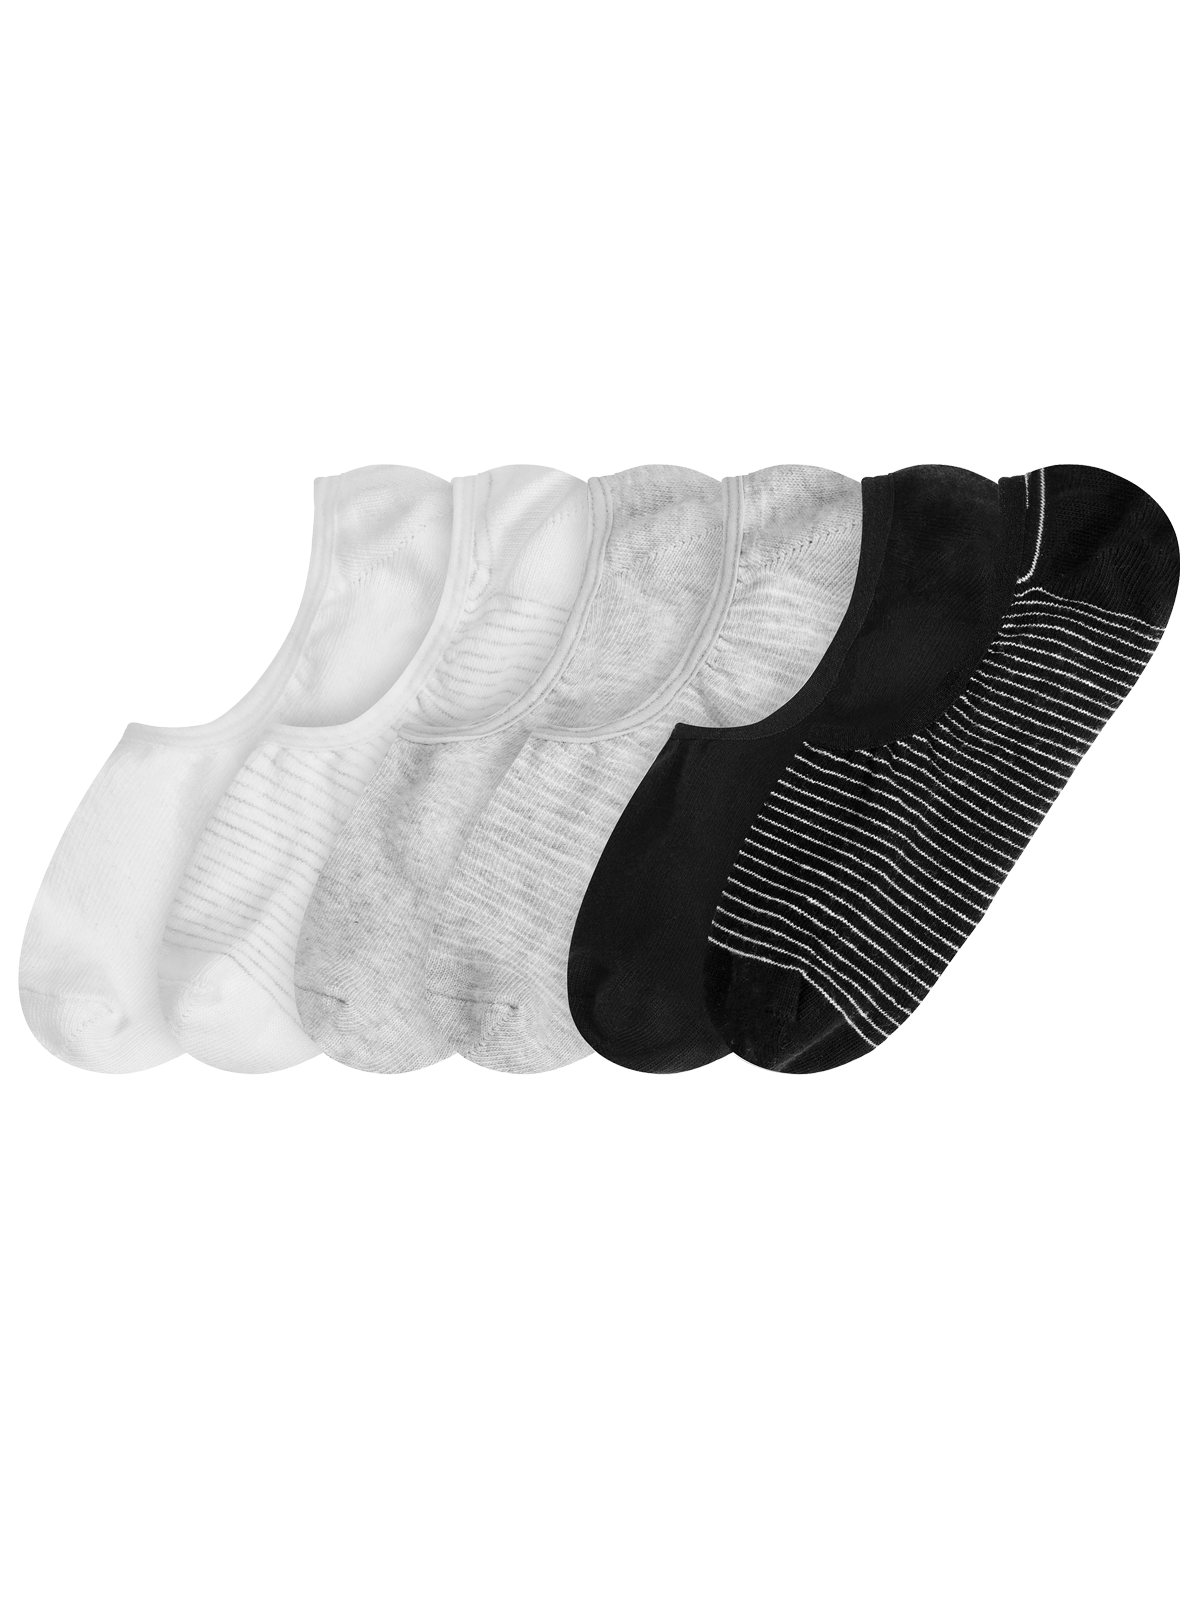 Invisible Socks 6-p Svart/Grå/Vit